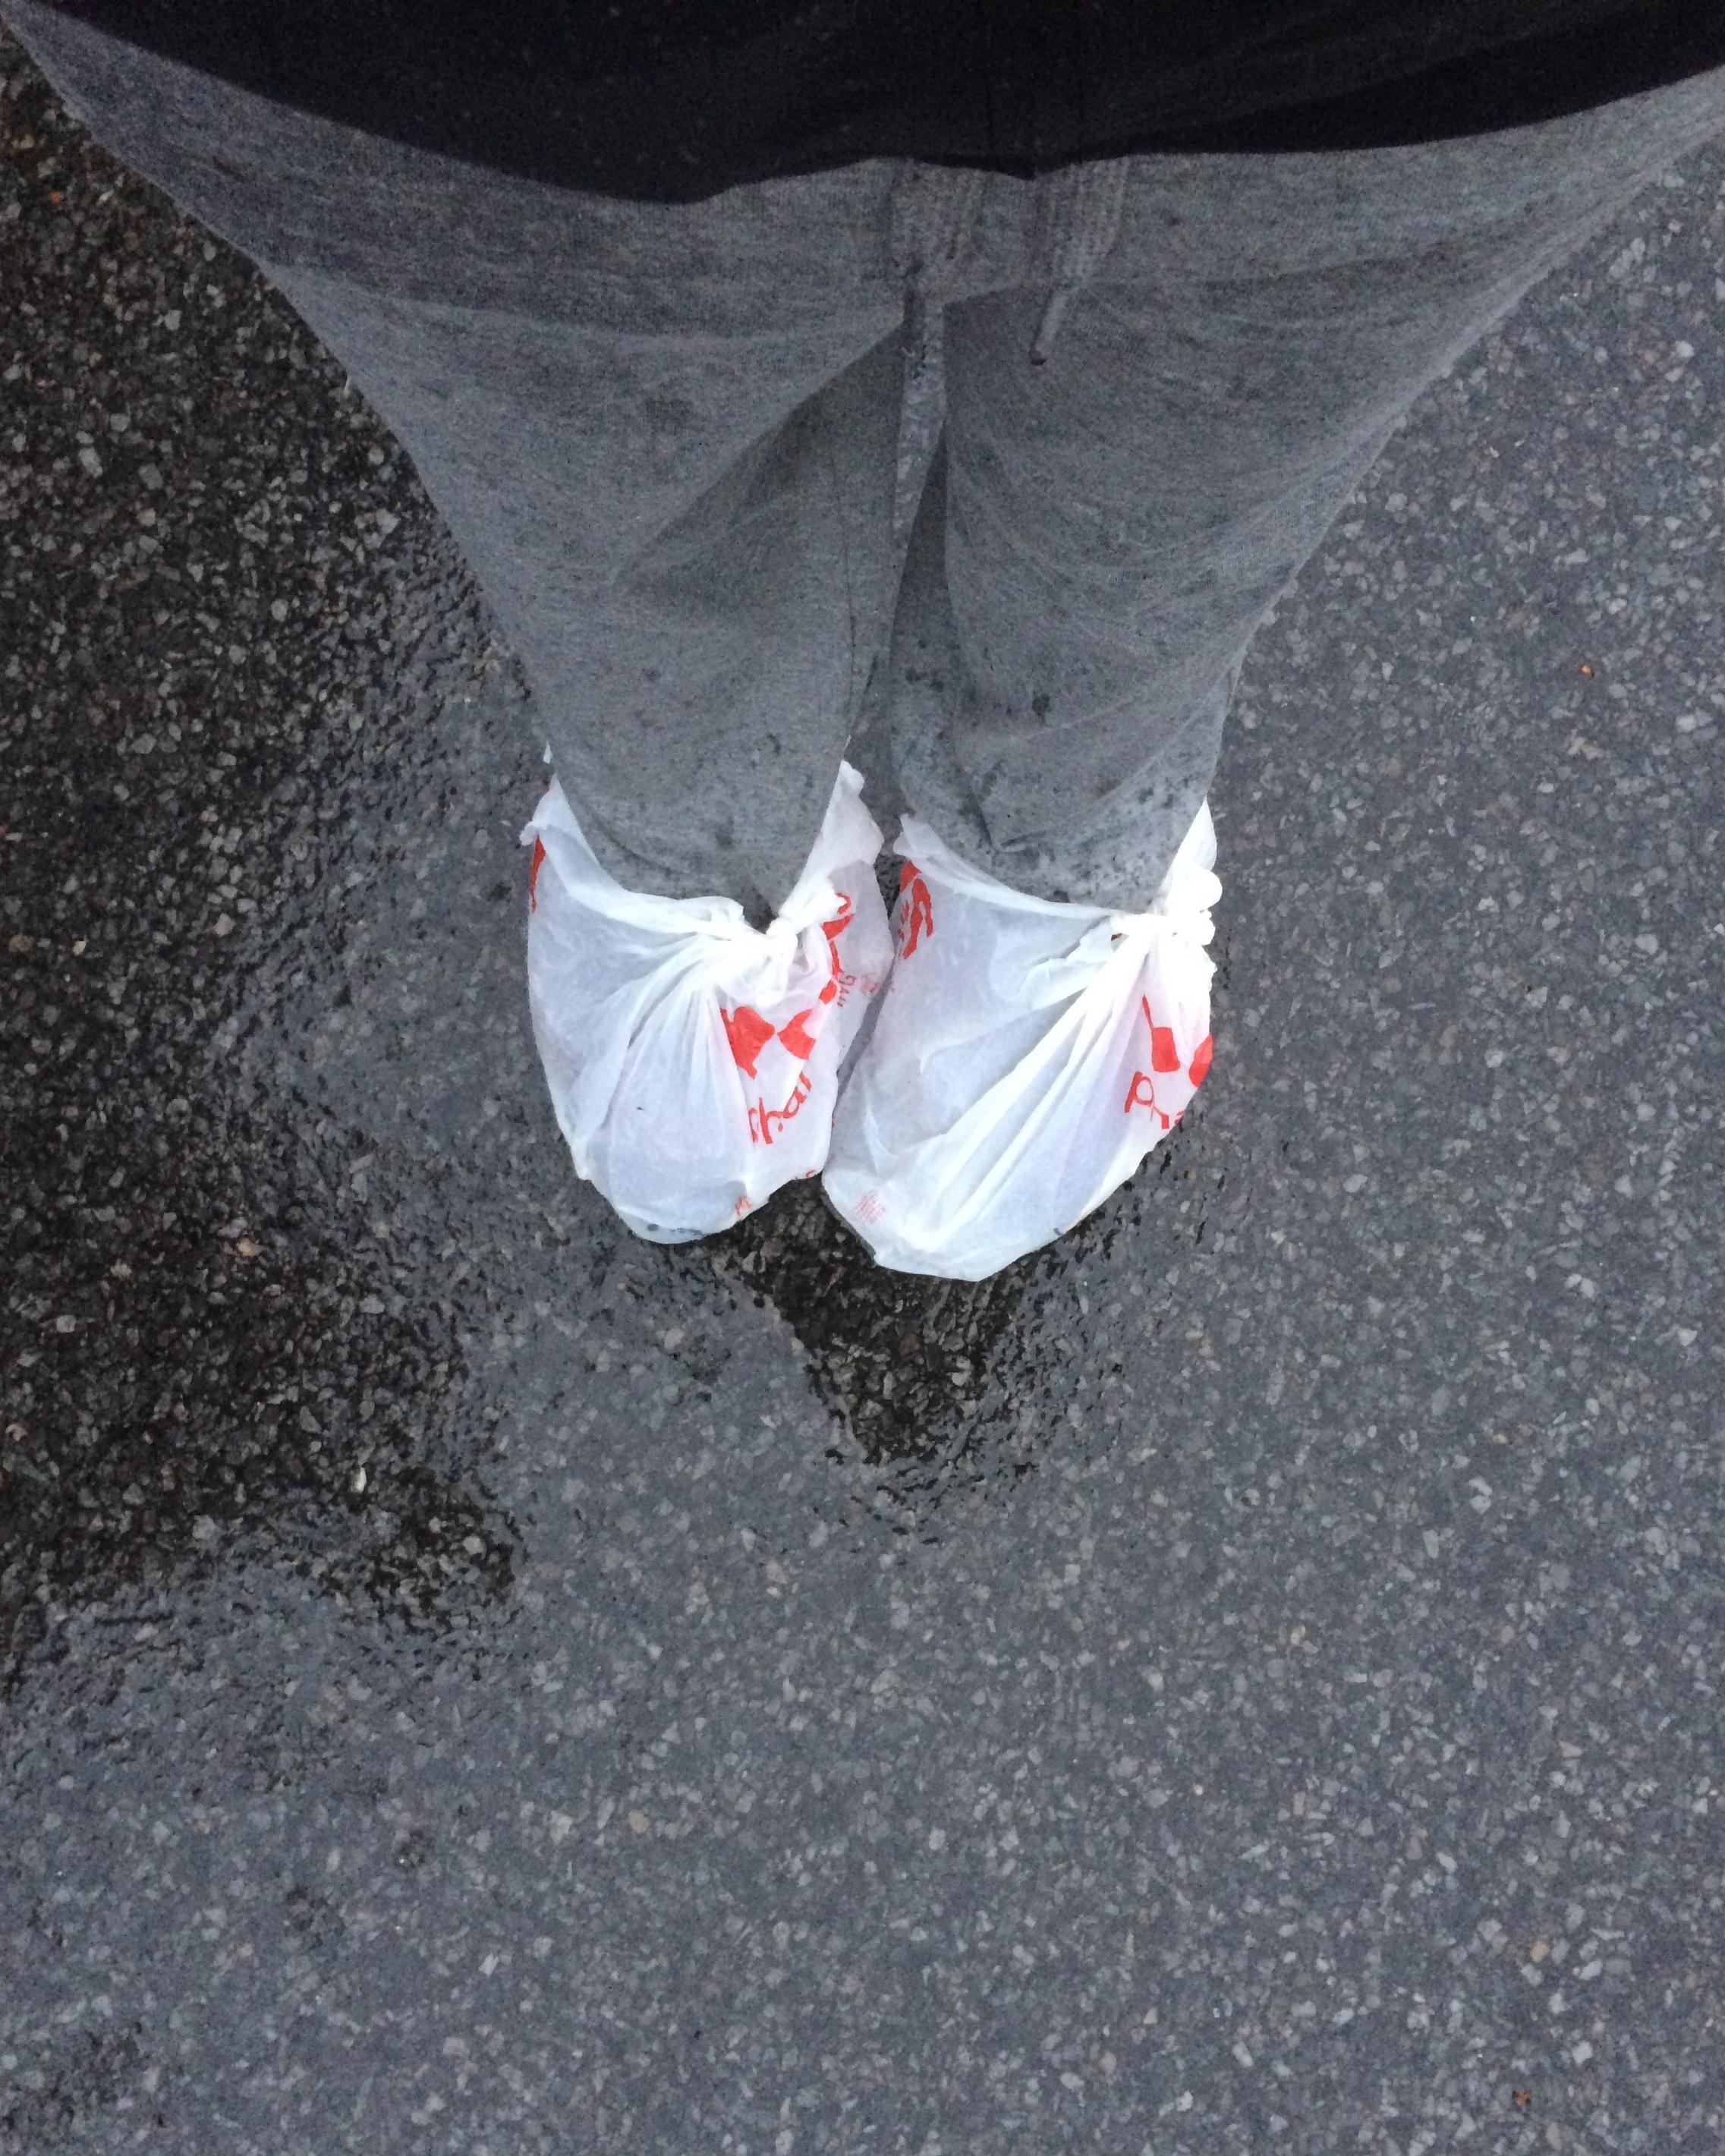 Not as effective as rain boots!